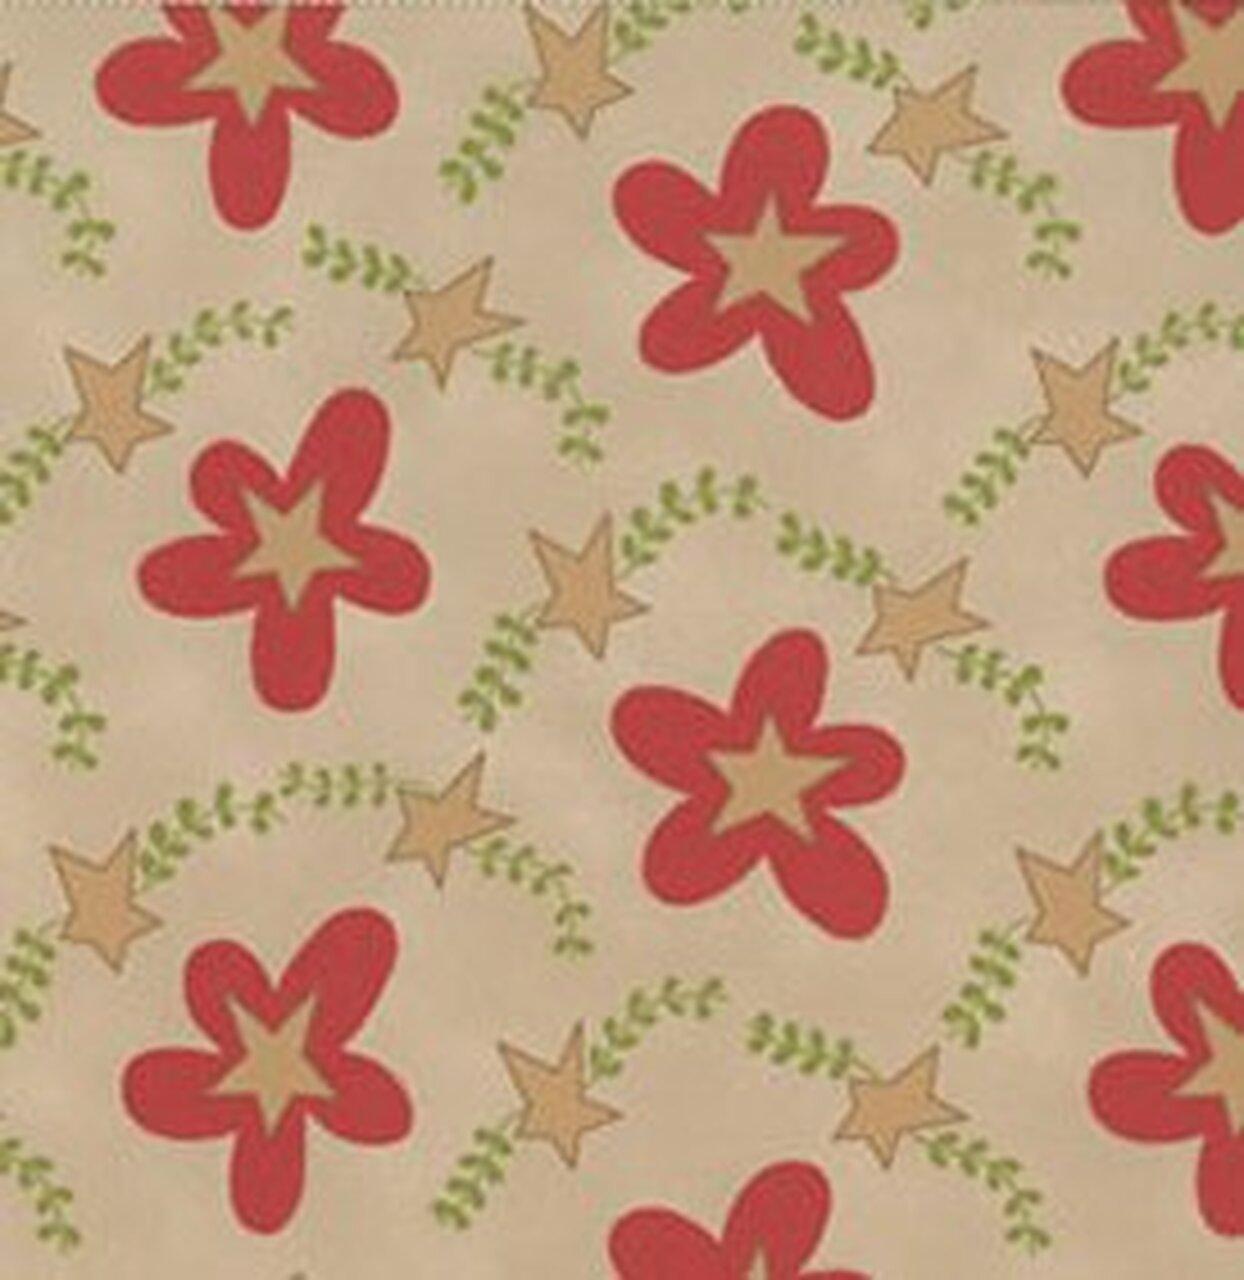 F-CB-CWK-SHA-17 Clothworks-Shasta Pr-17-Shasta Khaki (Tan w/ Red flowers & Stars)